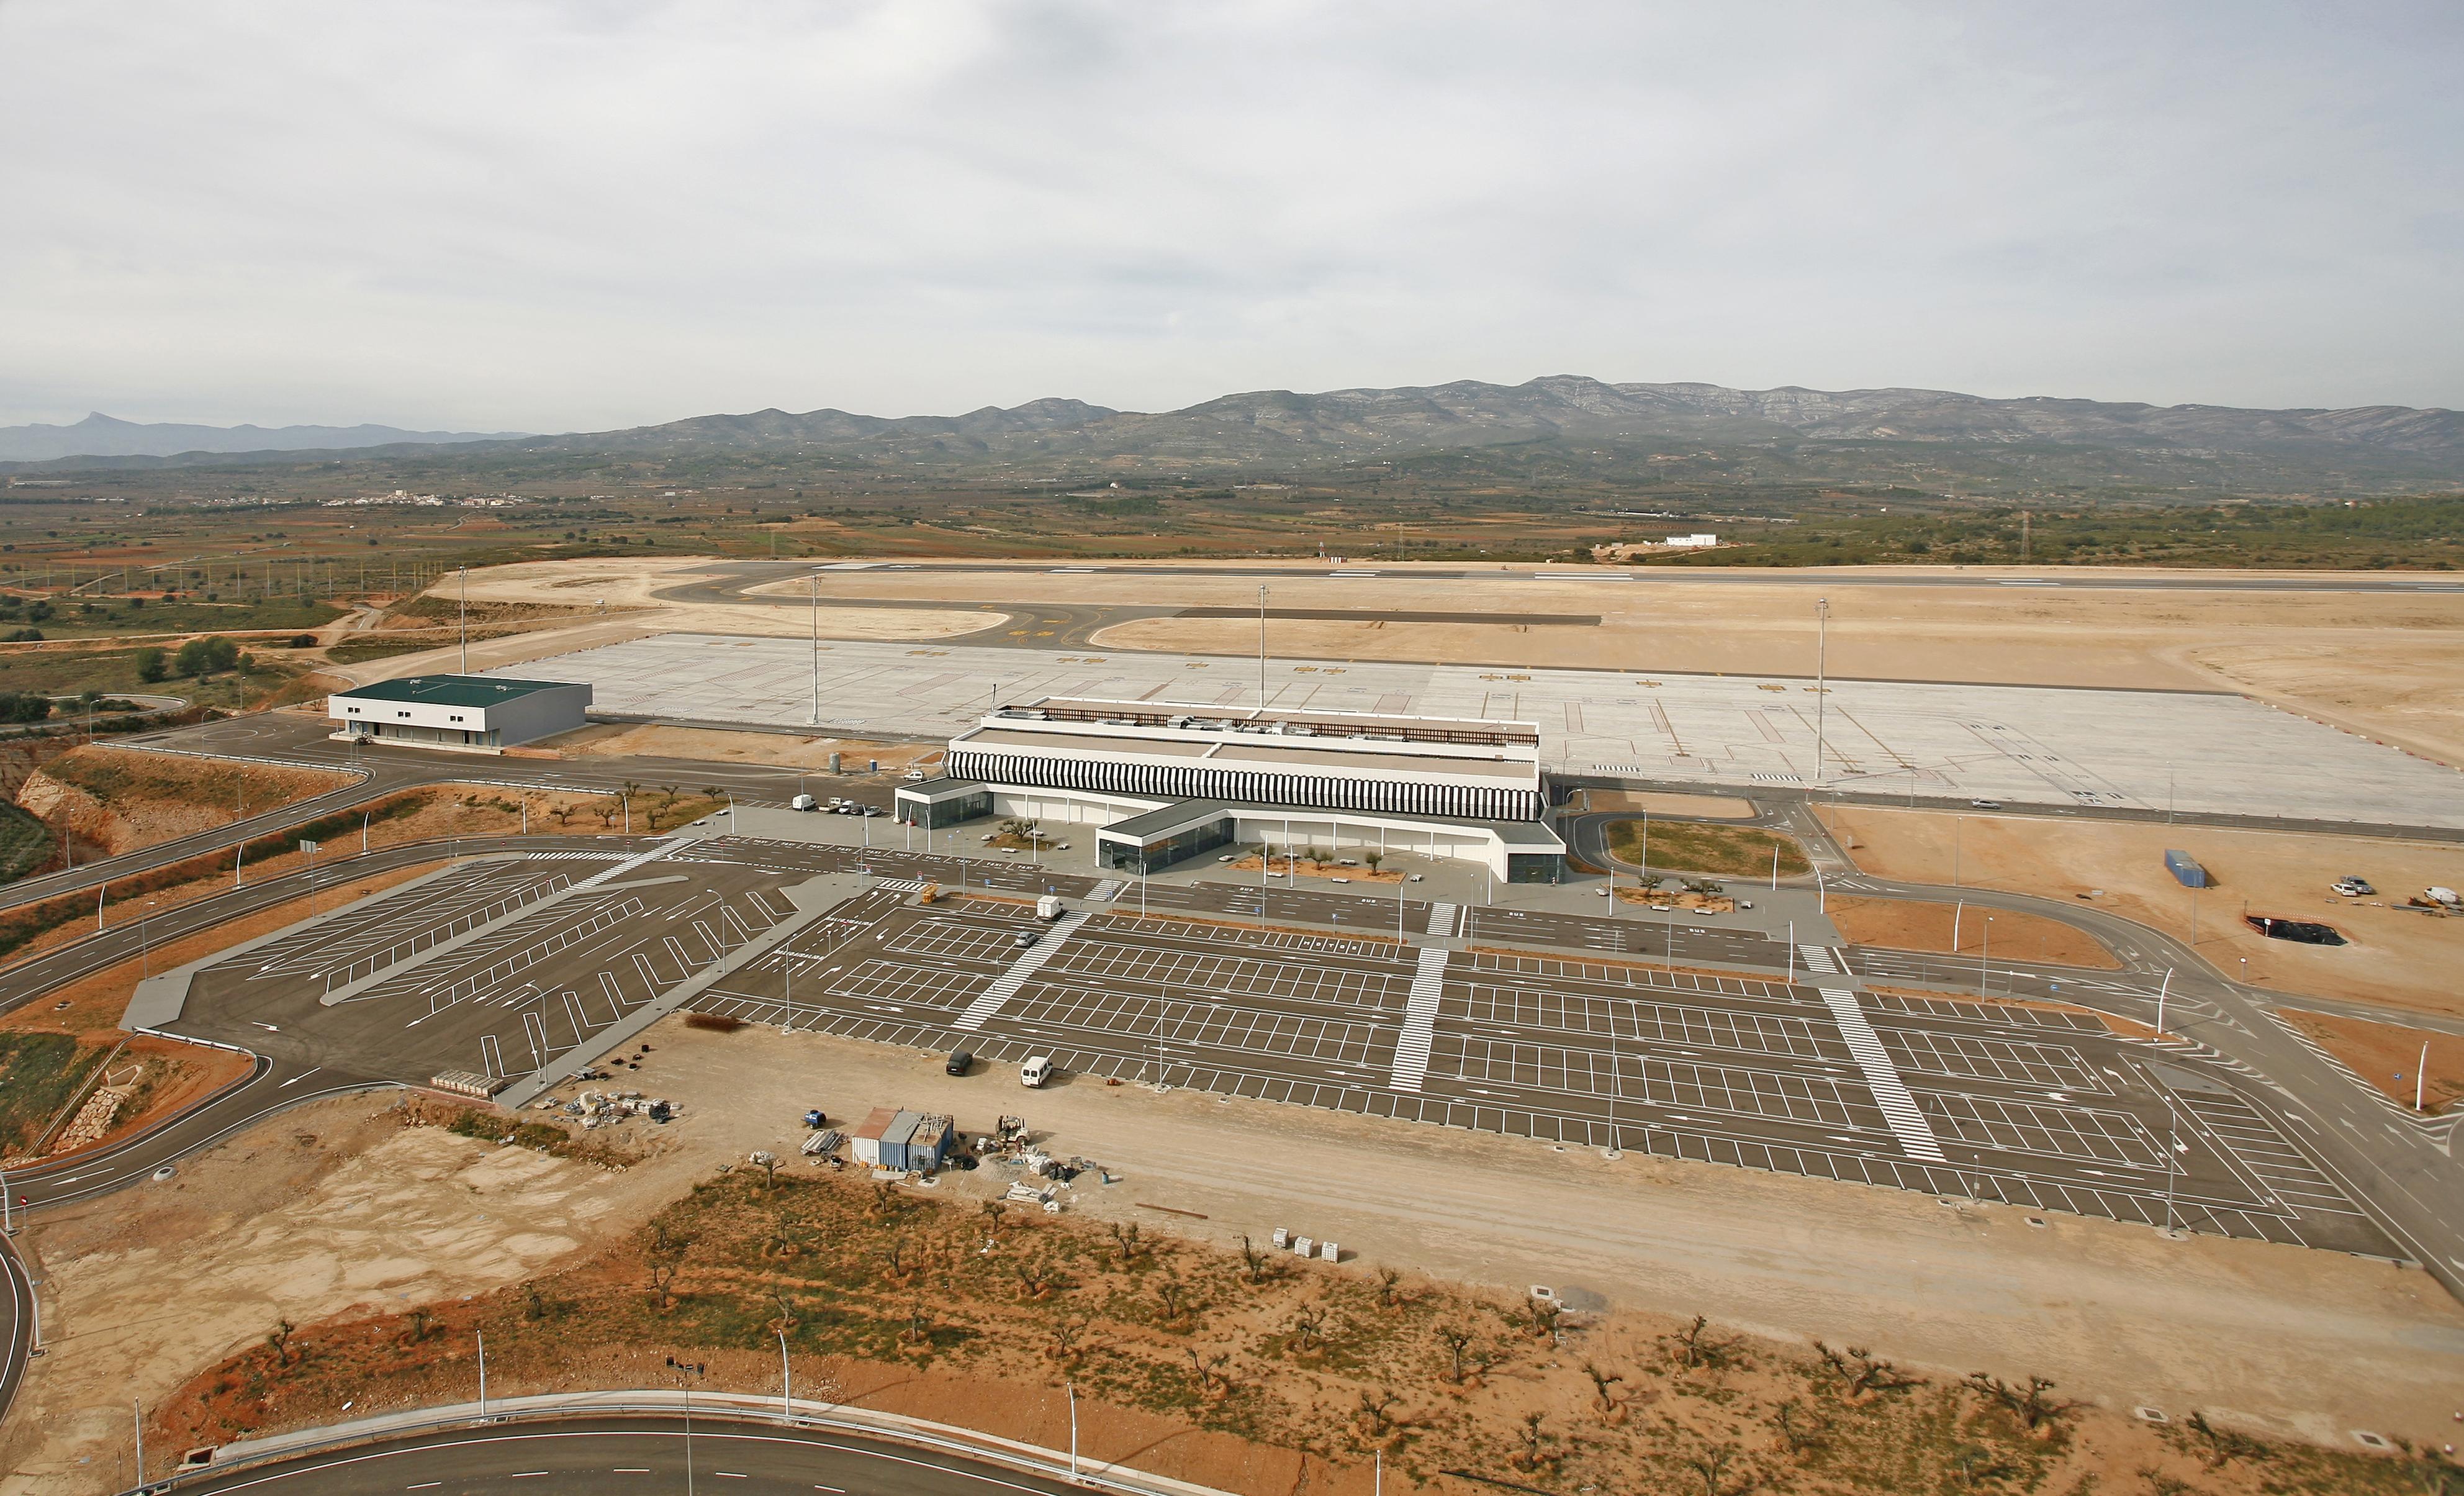 Vista aerea Aeropuerto Castellón